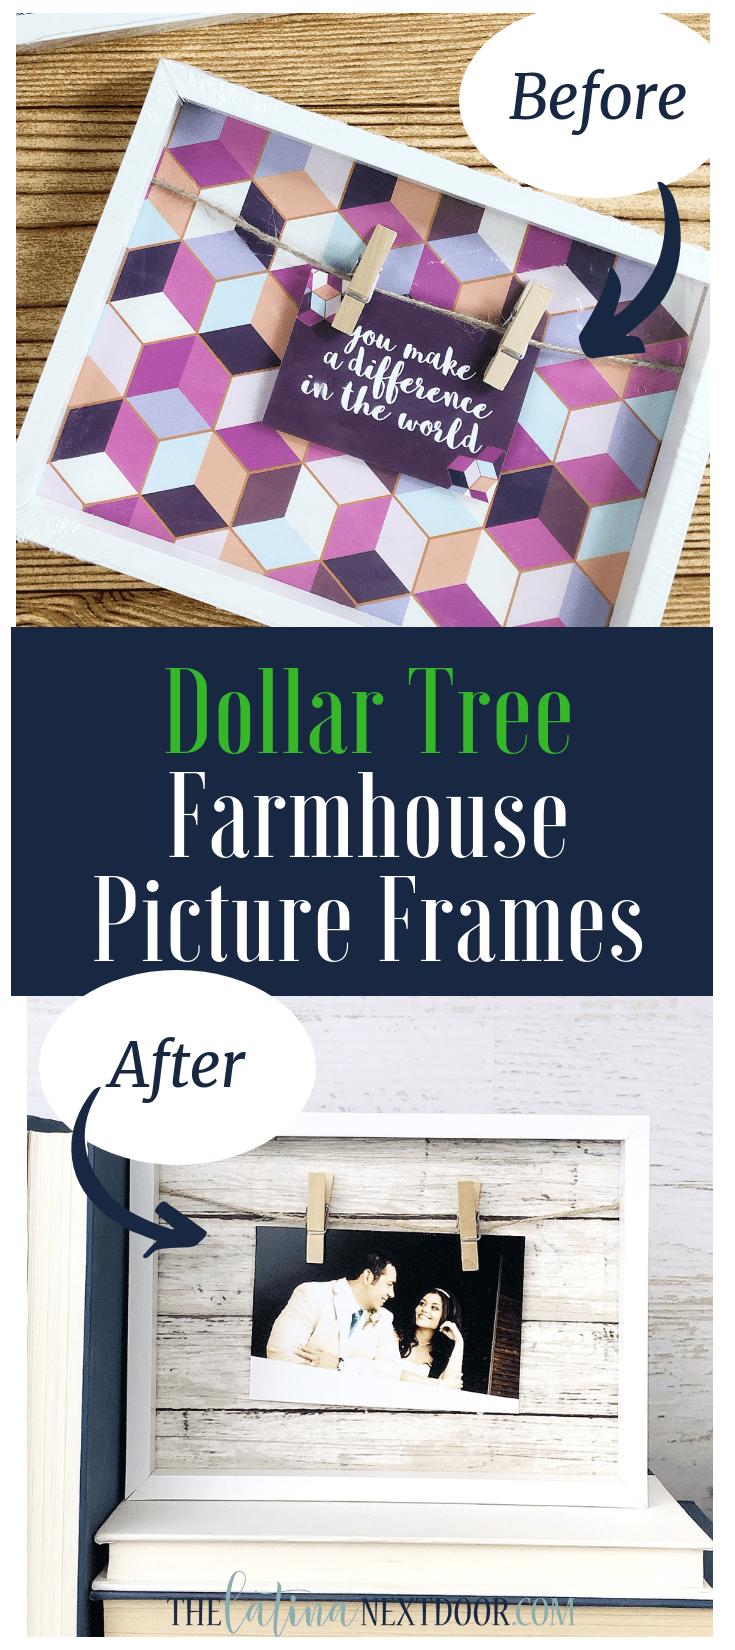 DIY Dollar Tree Farmhouse Picture Frames #dollartreecrafts